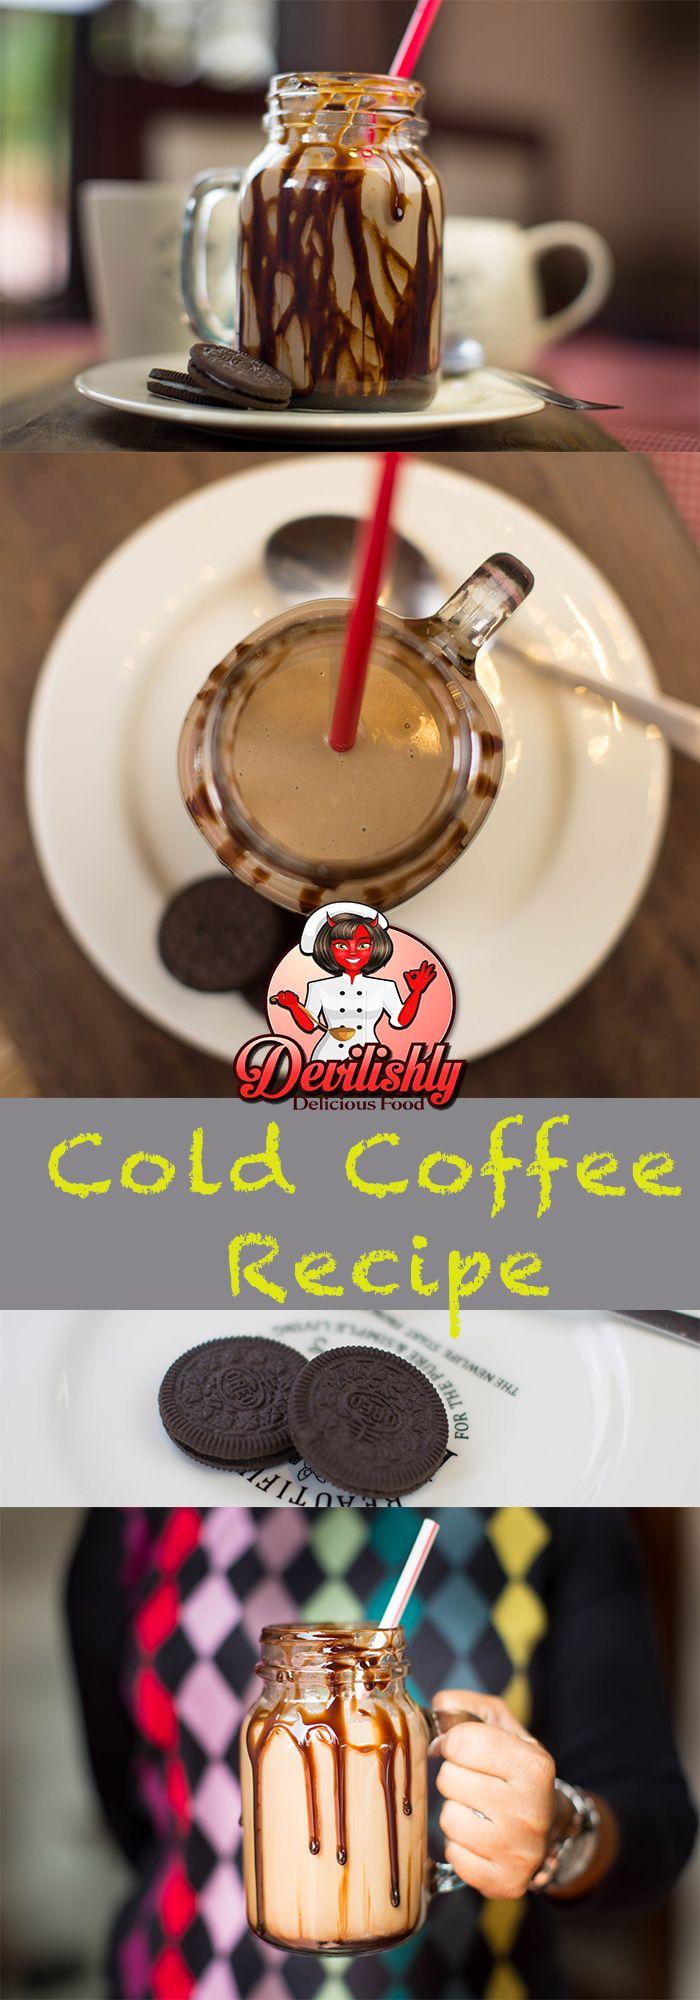 #IcedCoffee, #CoffeeSmoothie, #vietnamese #icedcoffee, #VietnameseIcedMilkCoffee, #IcedCoffeeIceCubes, #CoffeeIceCubes, #SimpleSyrupRecipe, #CoconutSimpleCyrup, SimpleSyrupCoffee, #coffeesweetener, #IcedCoffeeSweetener, #ChocolateSmoothie, #InsideOutCoffee, #CoffeeHacks, #IcedCoffeeHacks, #Iced Coffee Recipe, #SummerDrinks, #MasonJarDrinks, #The #DomesticGeek, v#Sara Lynn Cauchon, #CoffeeDrinks, #IcedCoffeeDrinks, #CoffeeBananaSmoothie